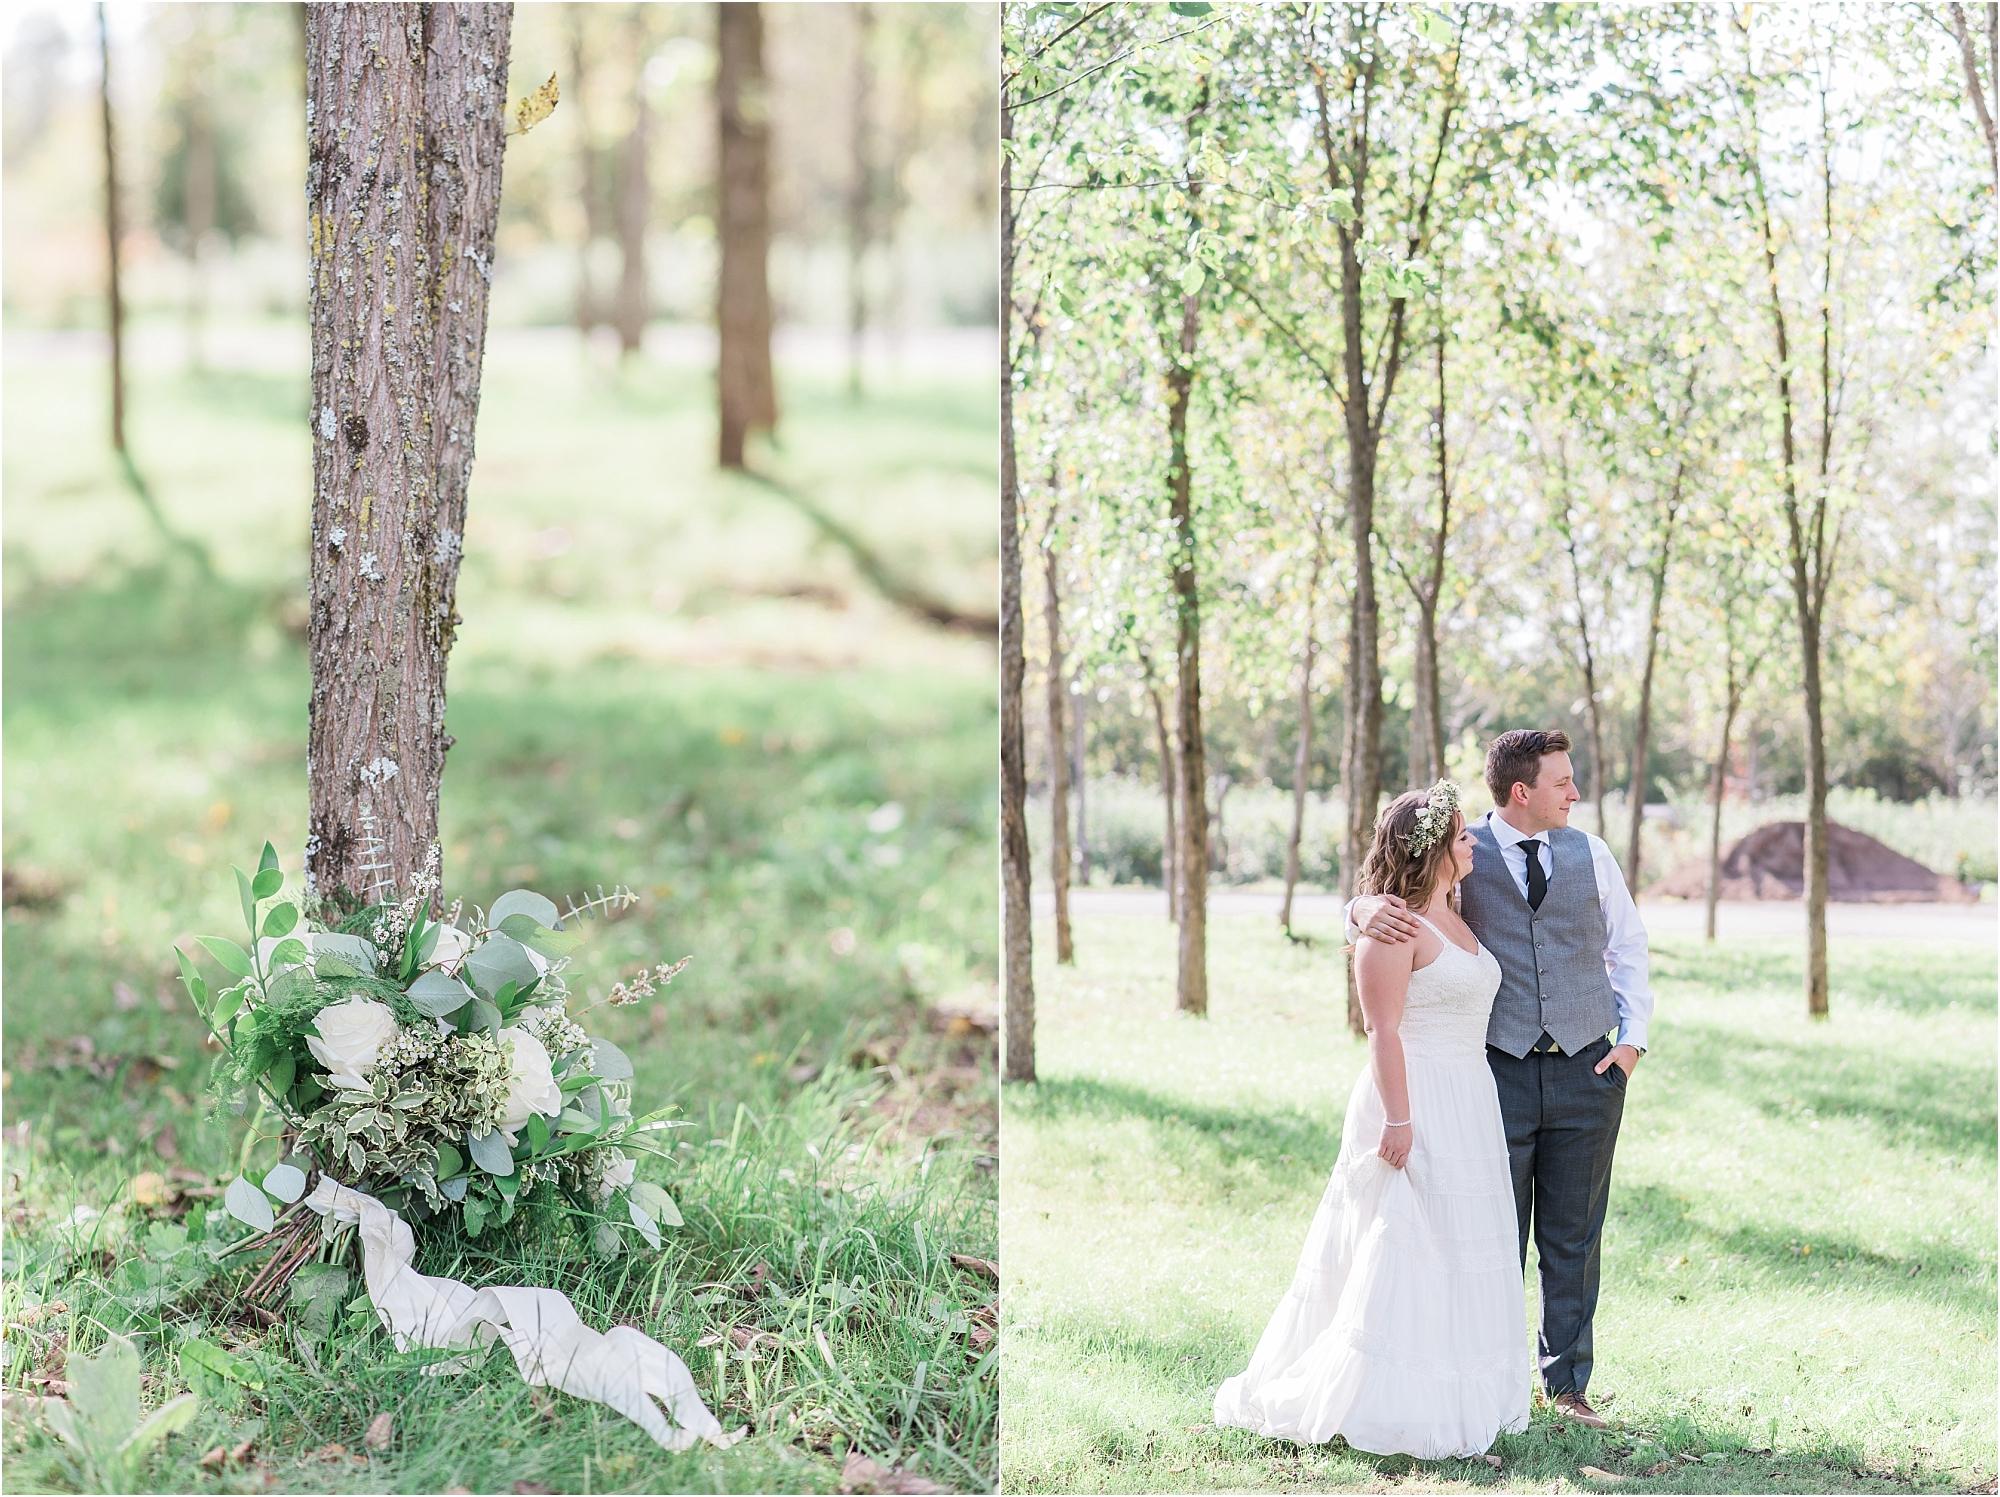 0044 Summer Stonefields Wedding Carleton Place - Ottawa Wedding - Photography by Emma_WEB.jpg